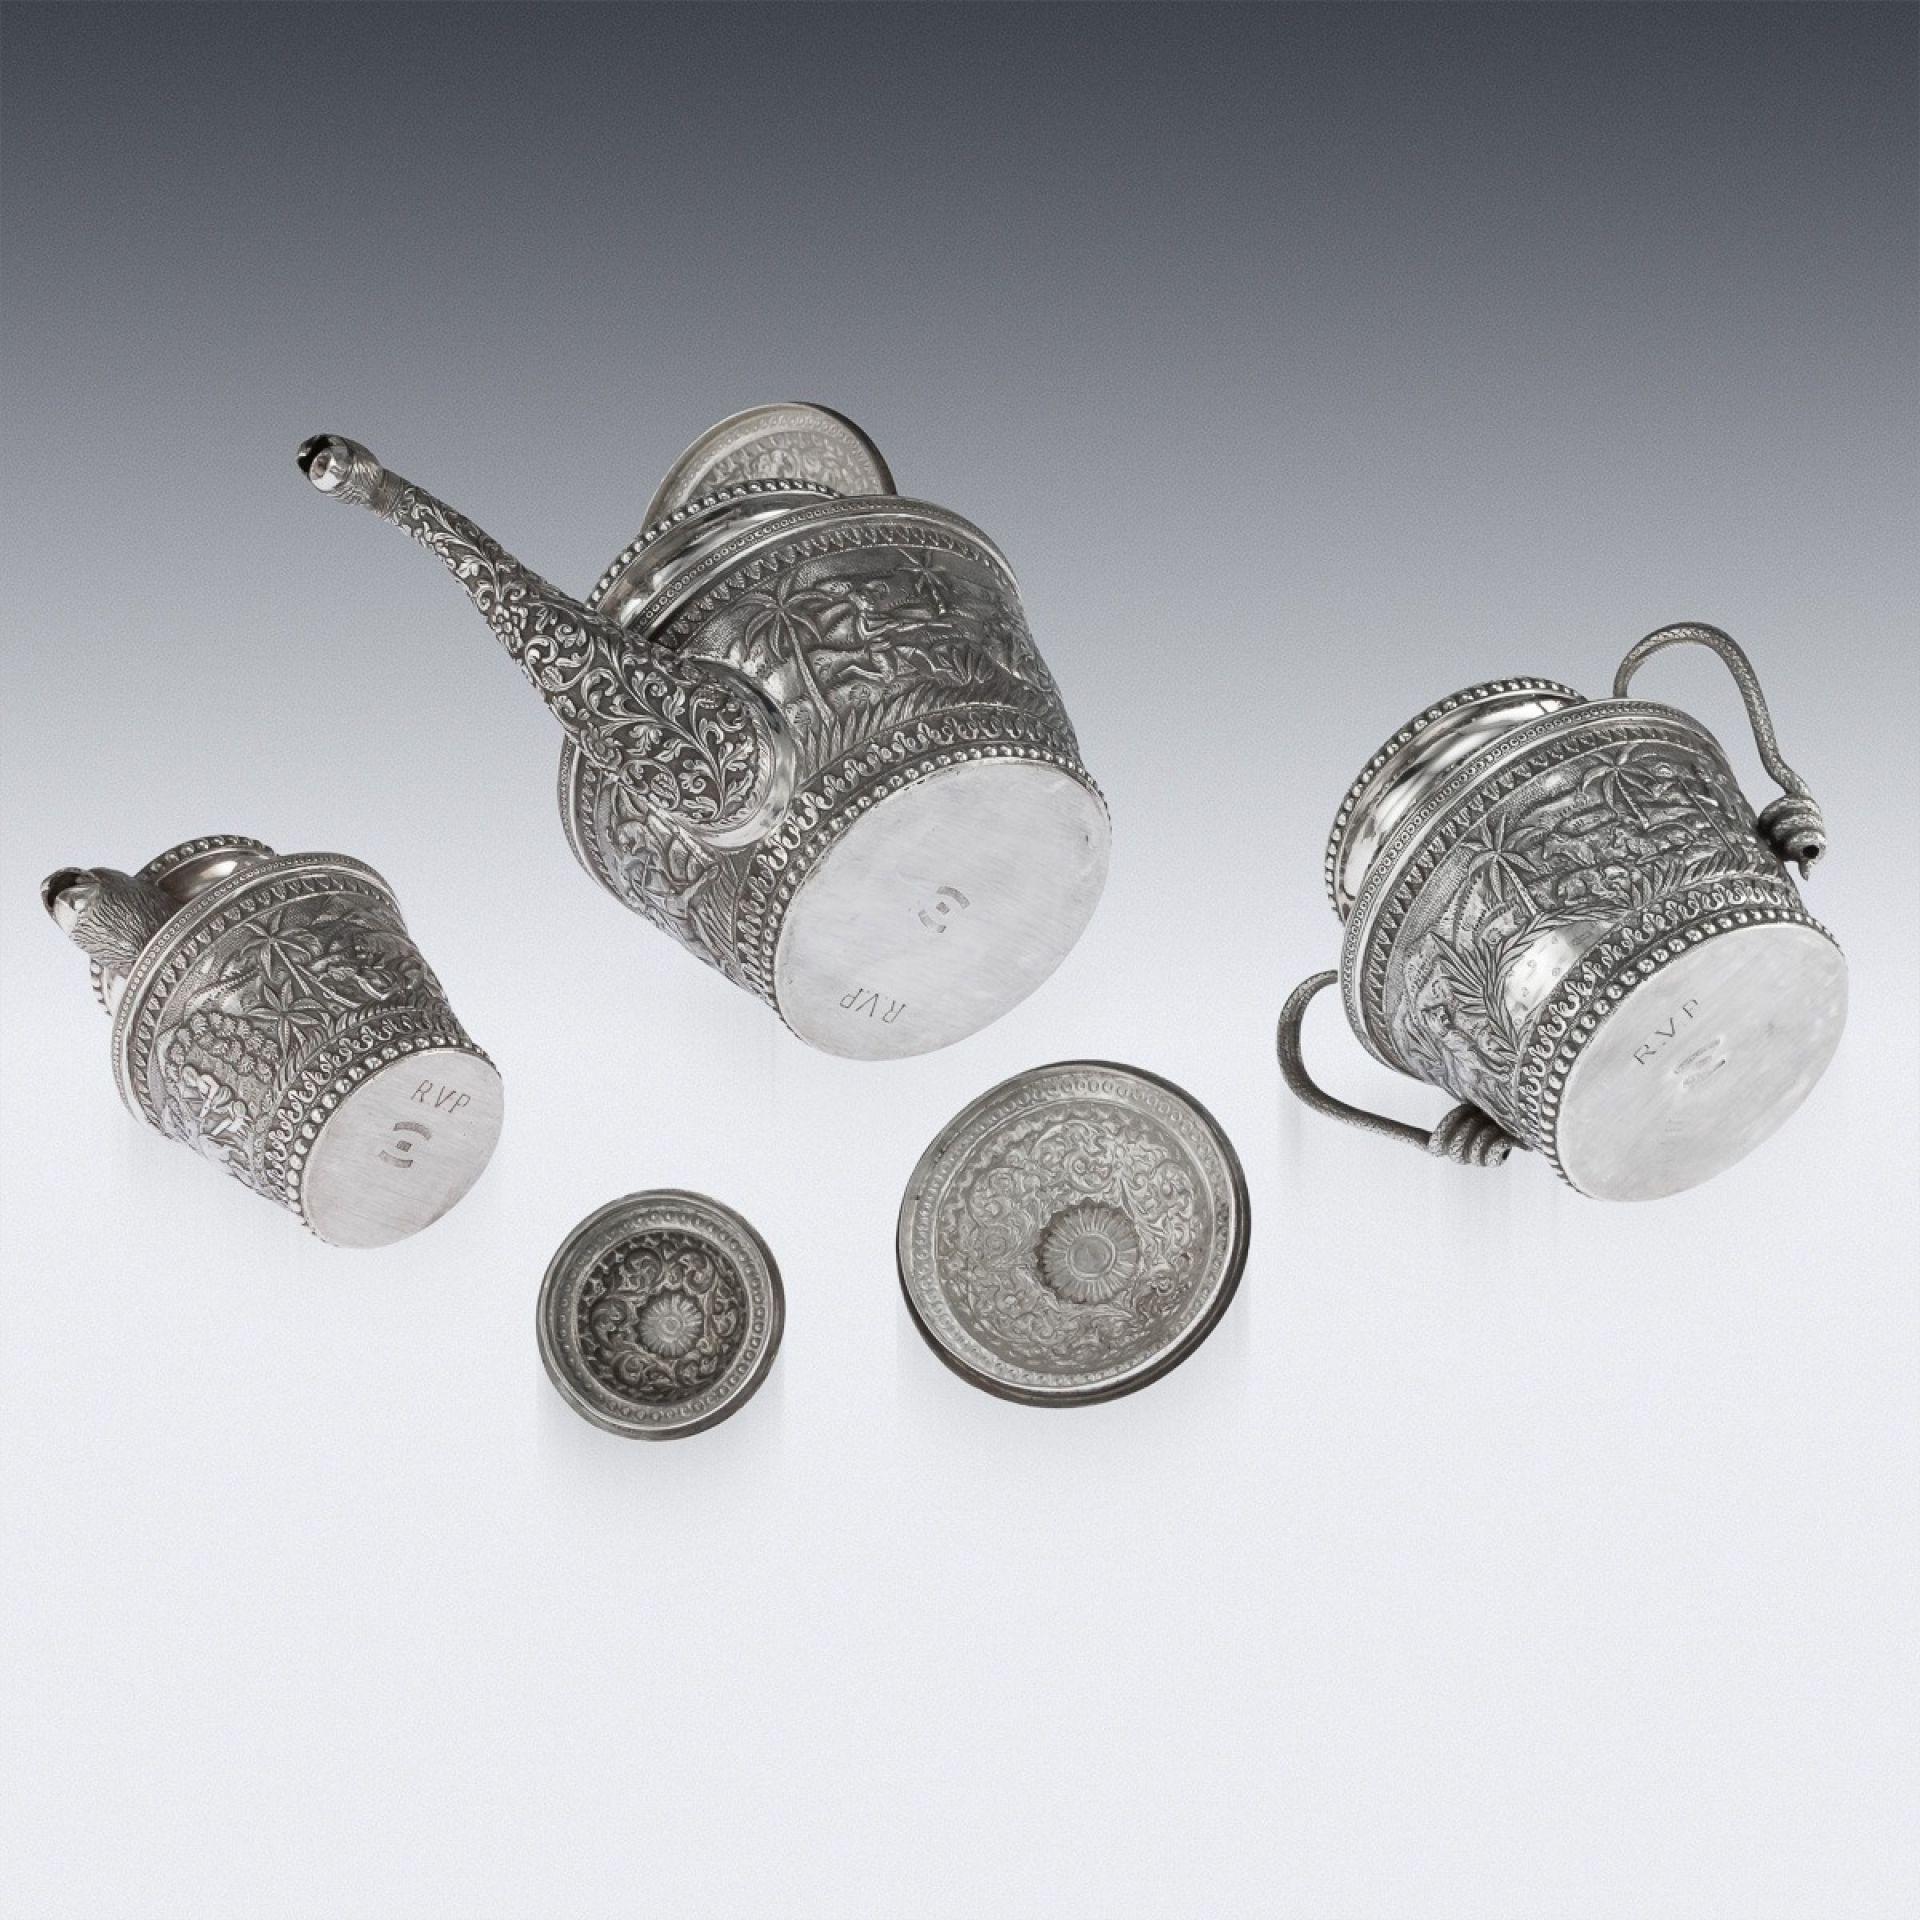 ANTIQUE 20thC INDIAN KARACHI-CUTCH SOLID SILVER TEA SET, J MANIKRAI c.1900